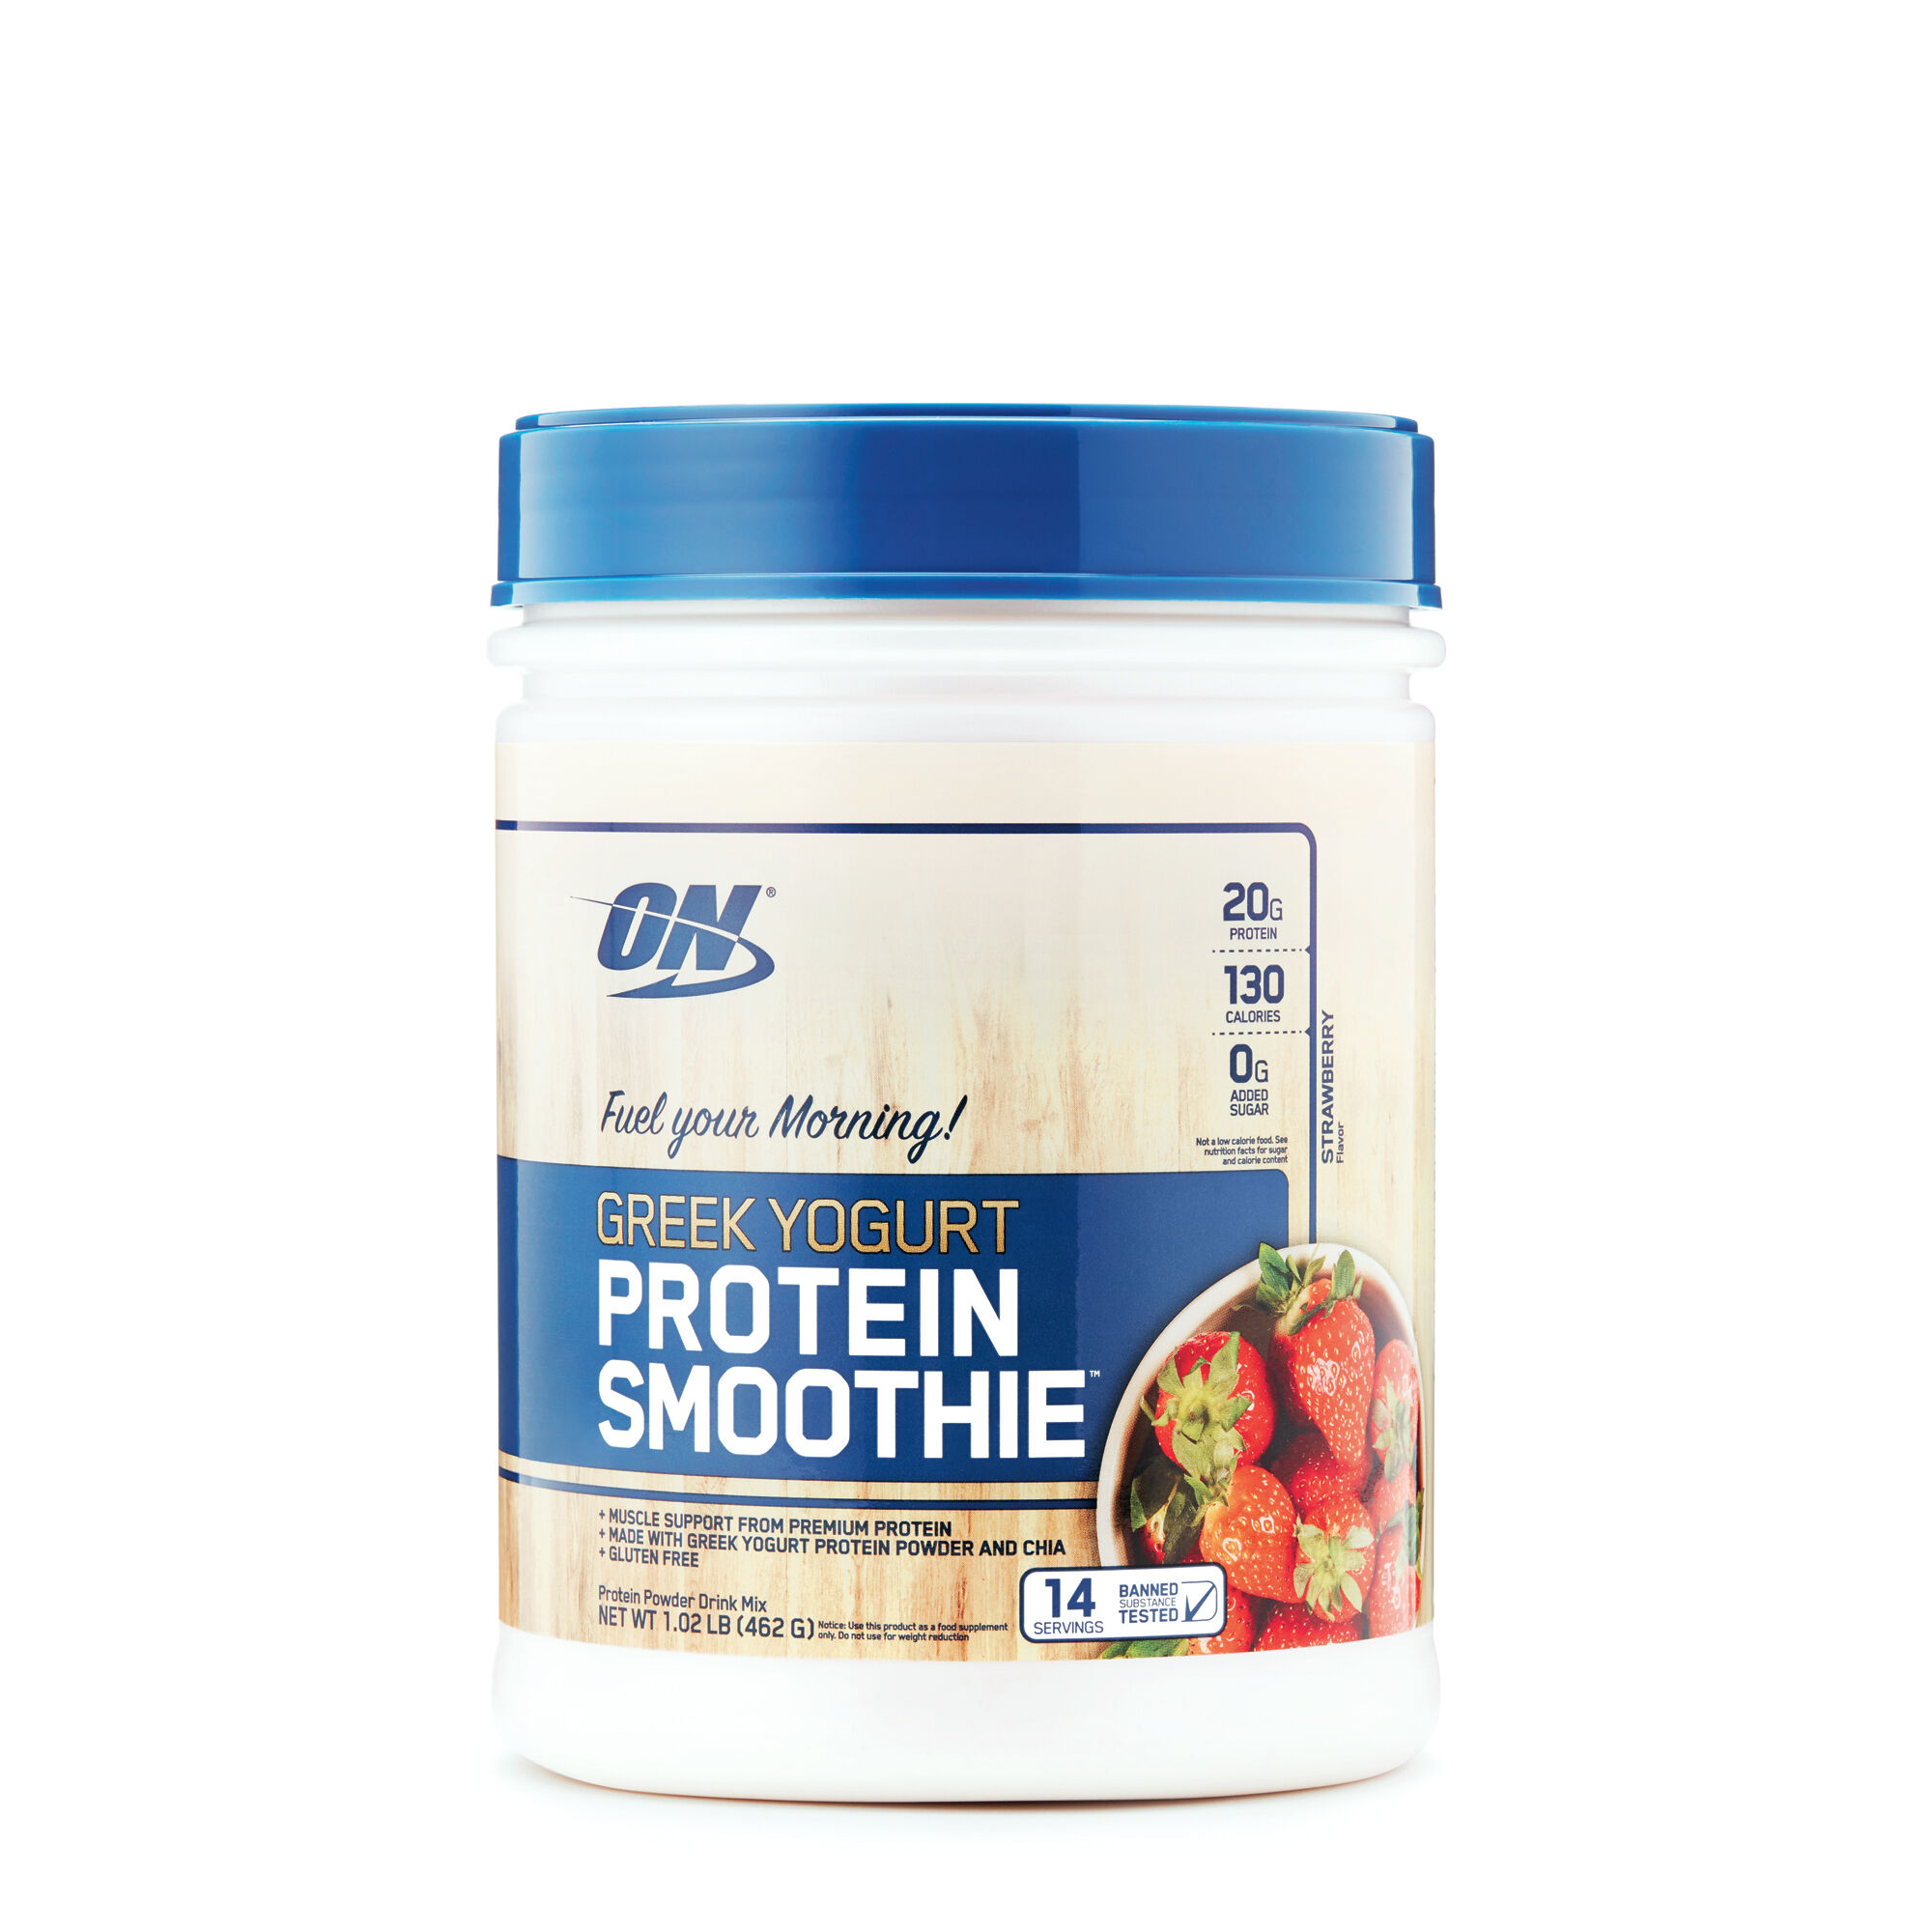 Gnc protein powder price : Hershey lodge coupon code